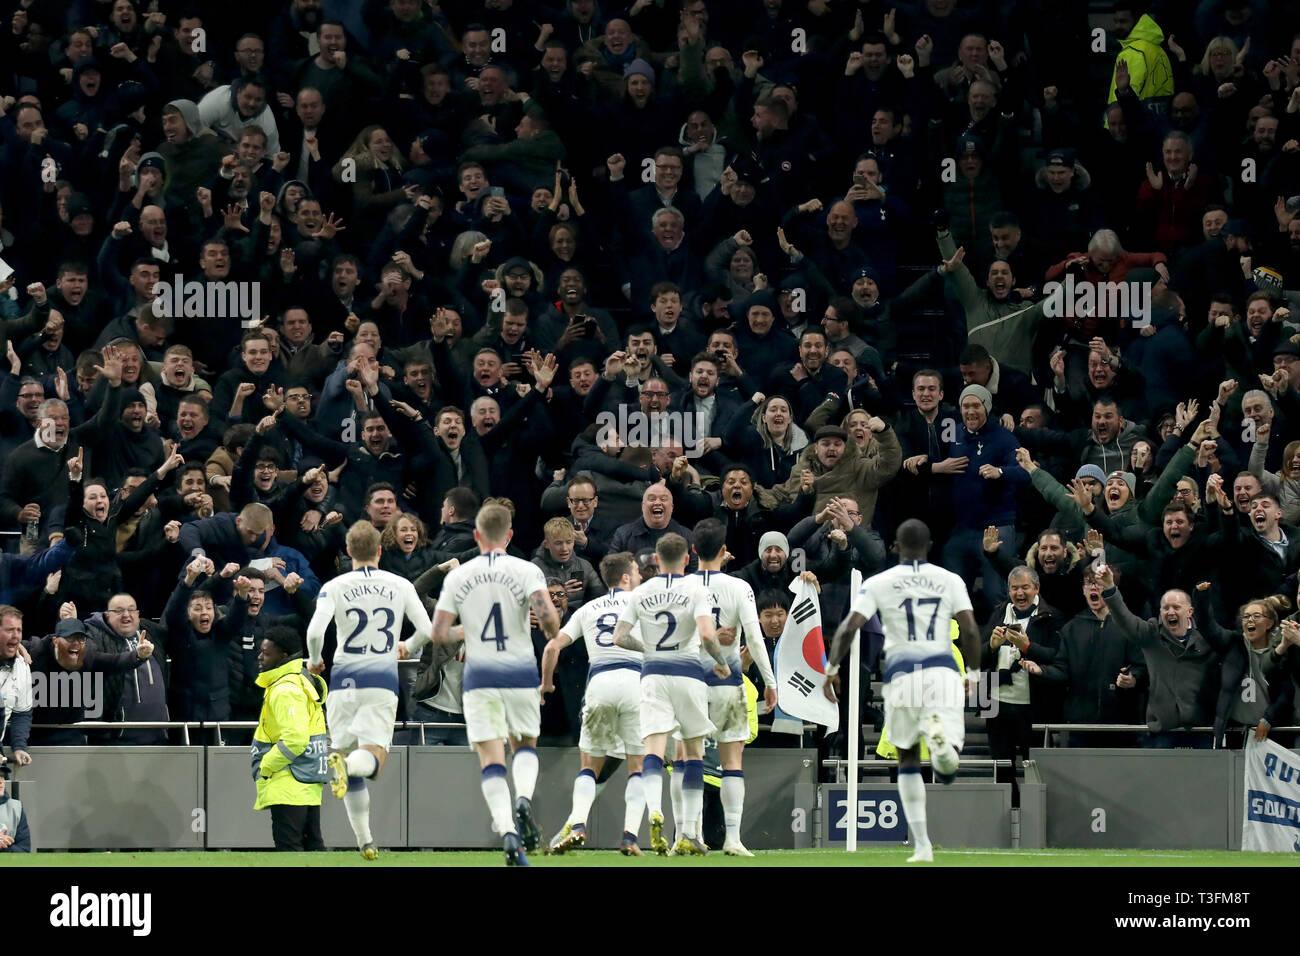 Tottenham Hotspur Stadium London Uk 9th Apr 2019 Uefa Champions League Football Quarter Final 1st Leg